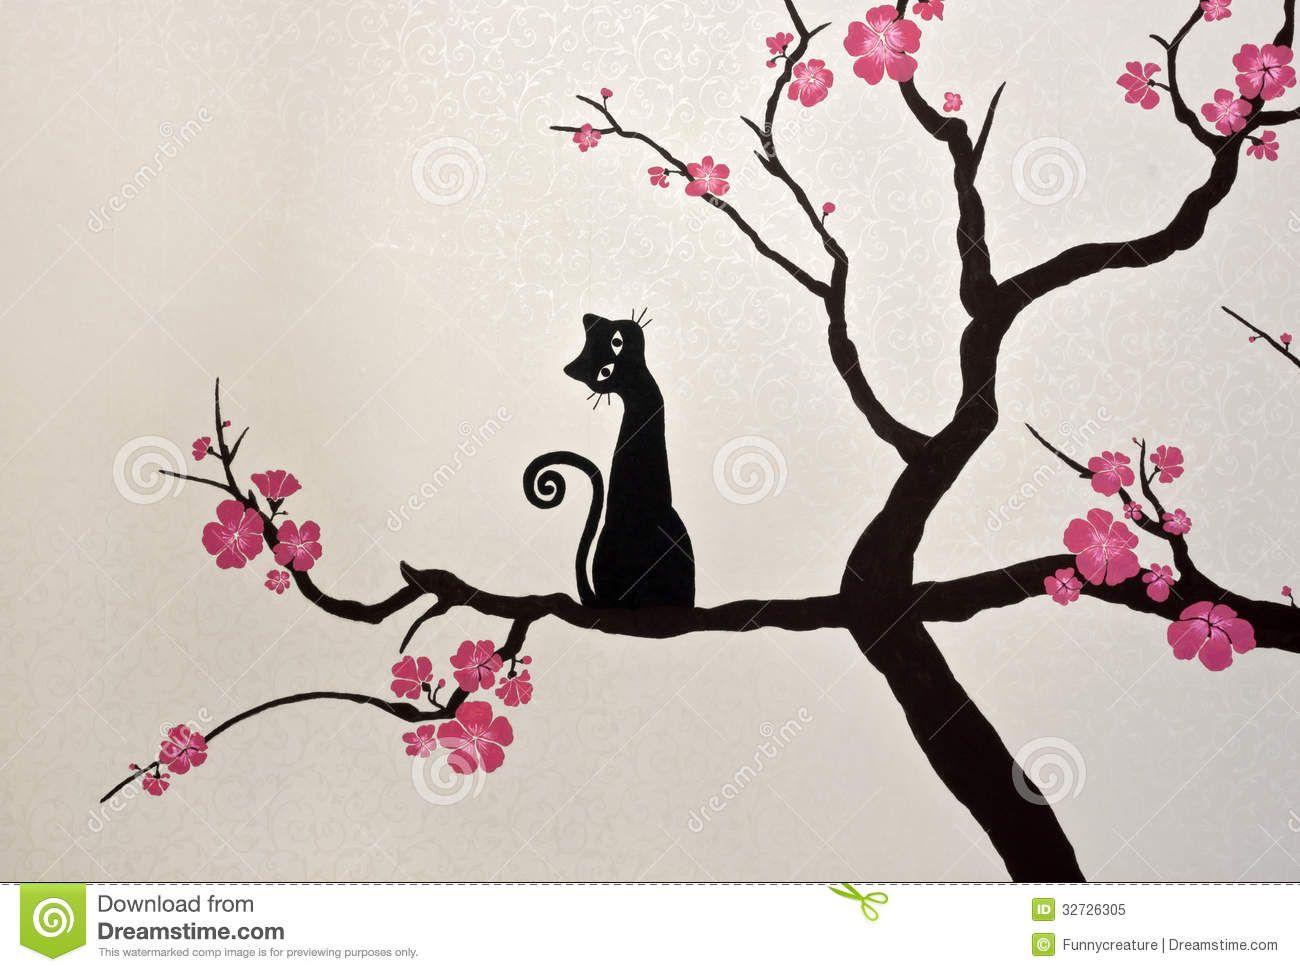 Http Thumbs Dreamstime Com Z Cat Sitting Blooming Sakura Branch Wallpaper Painting Drawing Pink Flowers P Pink Flower Painting Flower Drawing Flower Painting